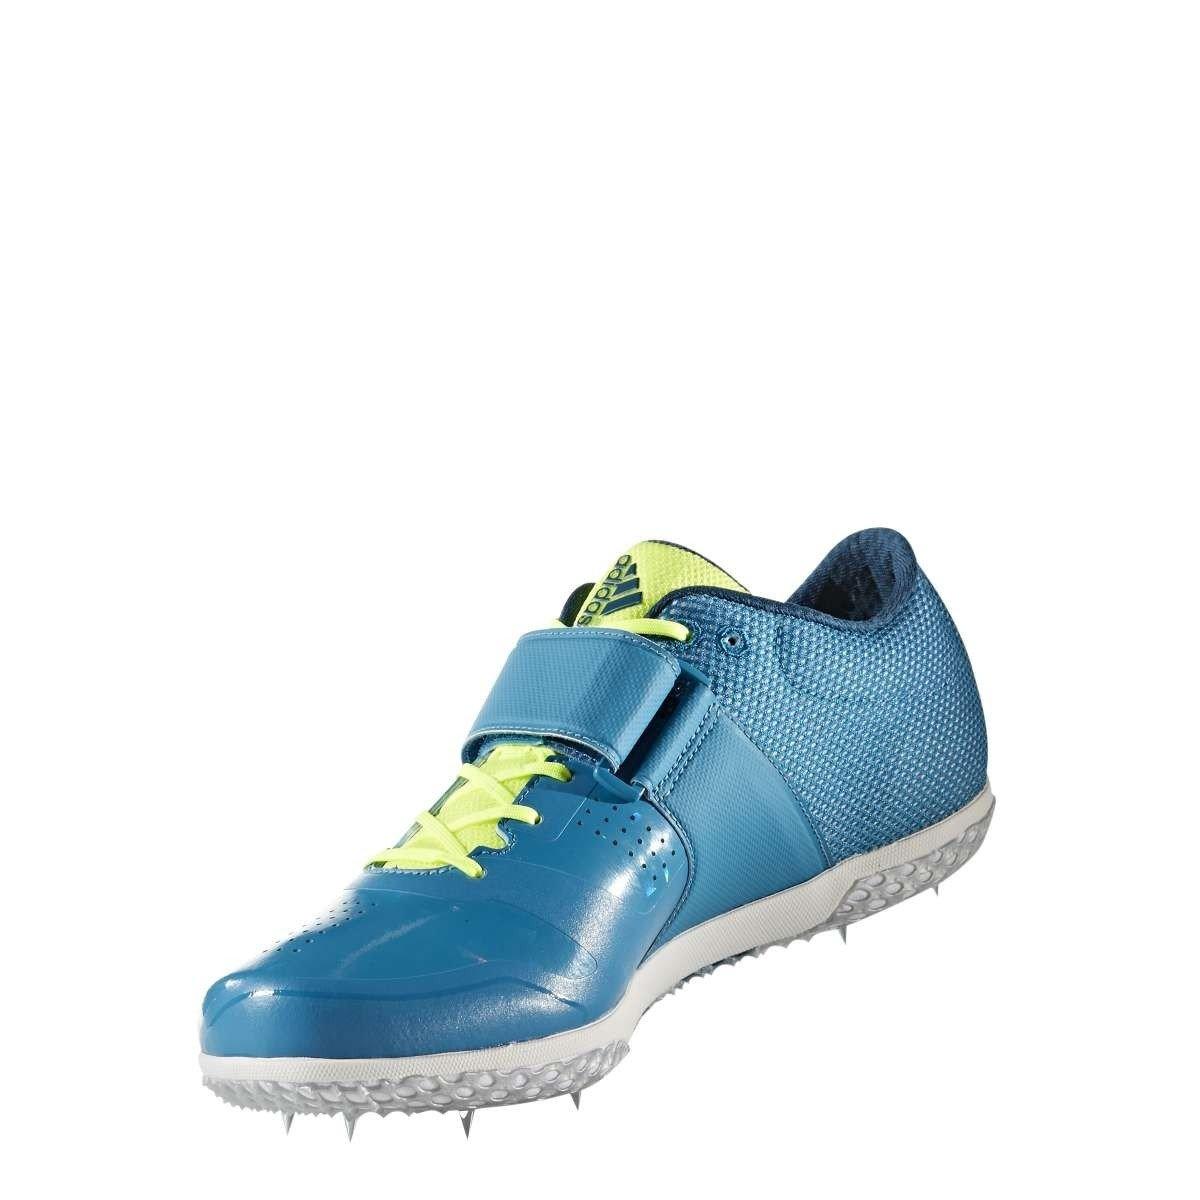 TALLA 44 EU. adidas Adizero Tj/Pv, Zapatillas de Running Unisex Adulto